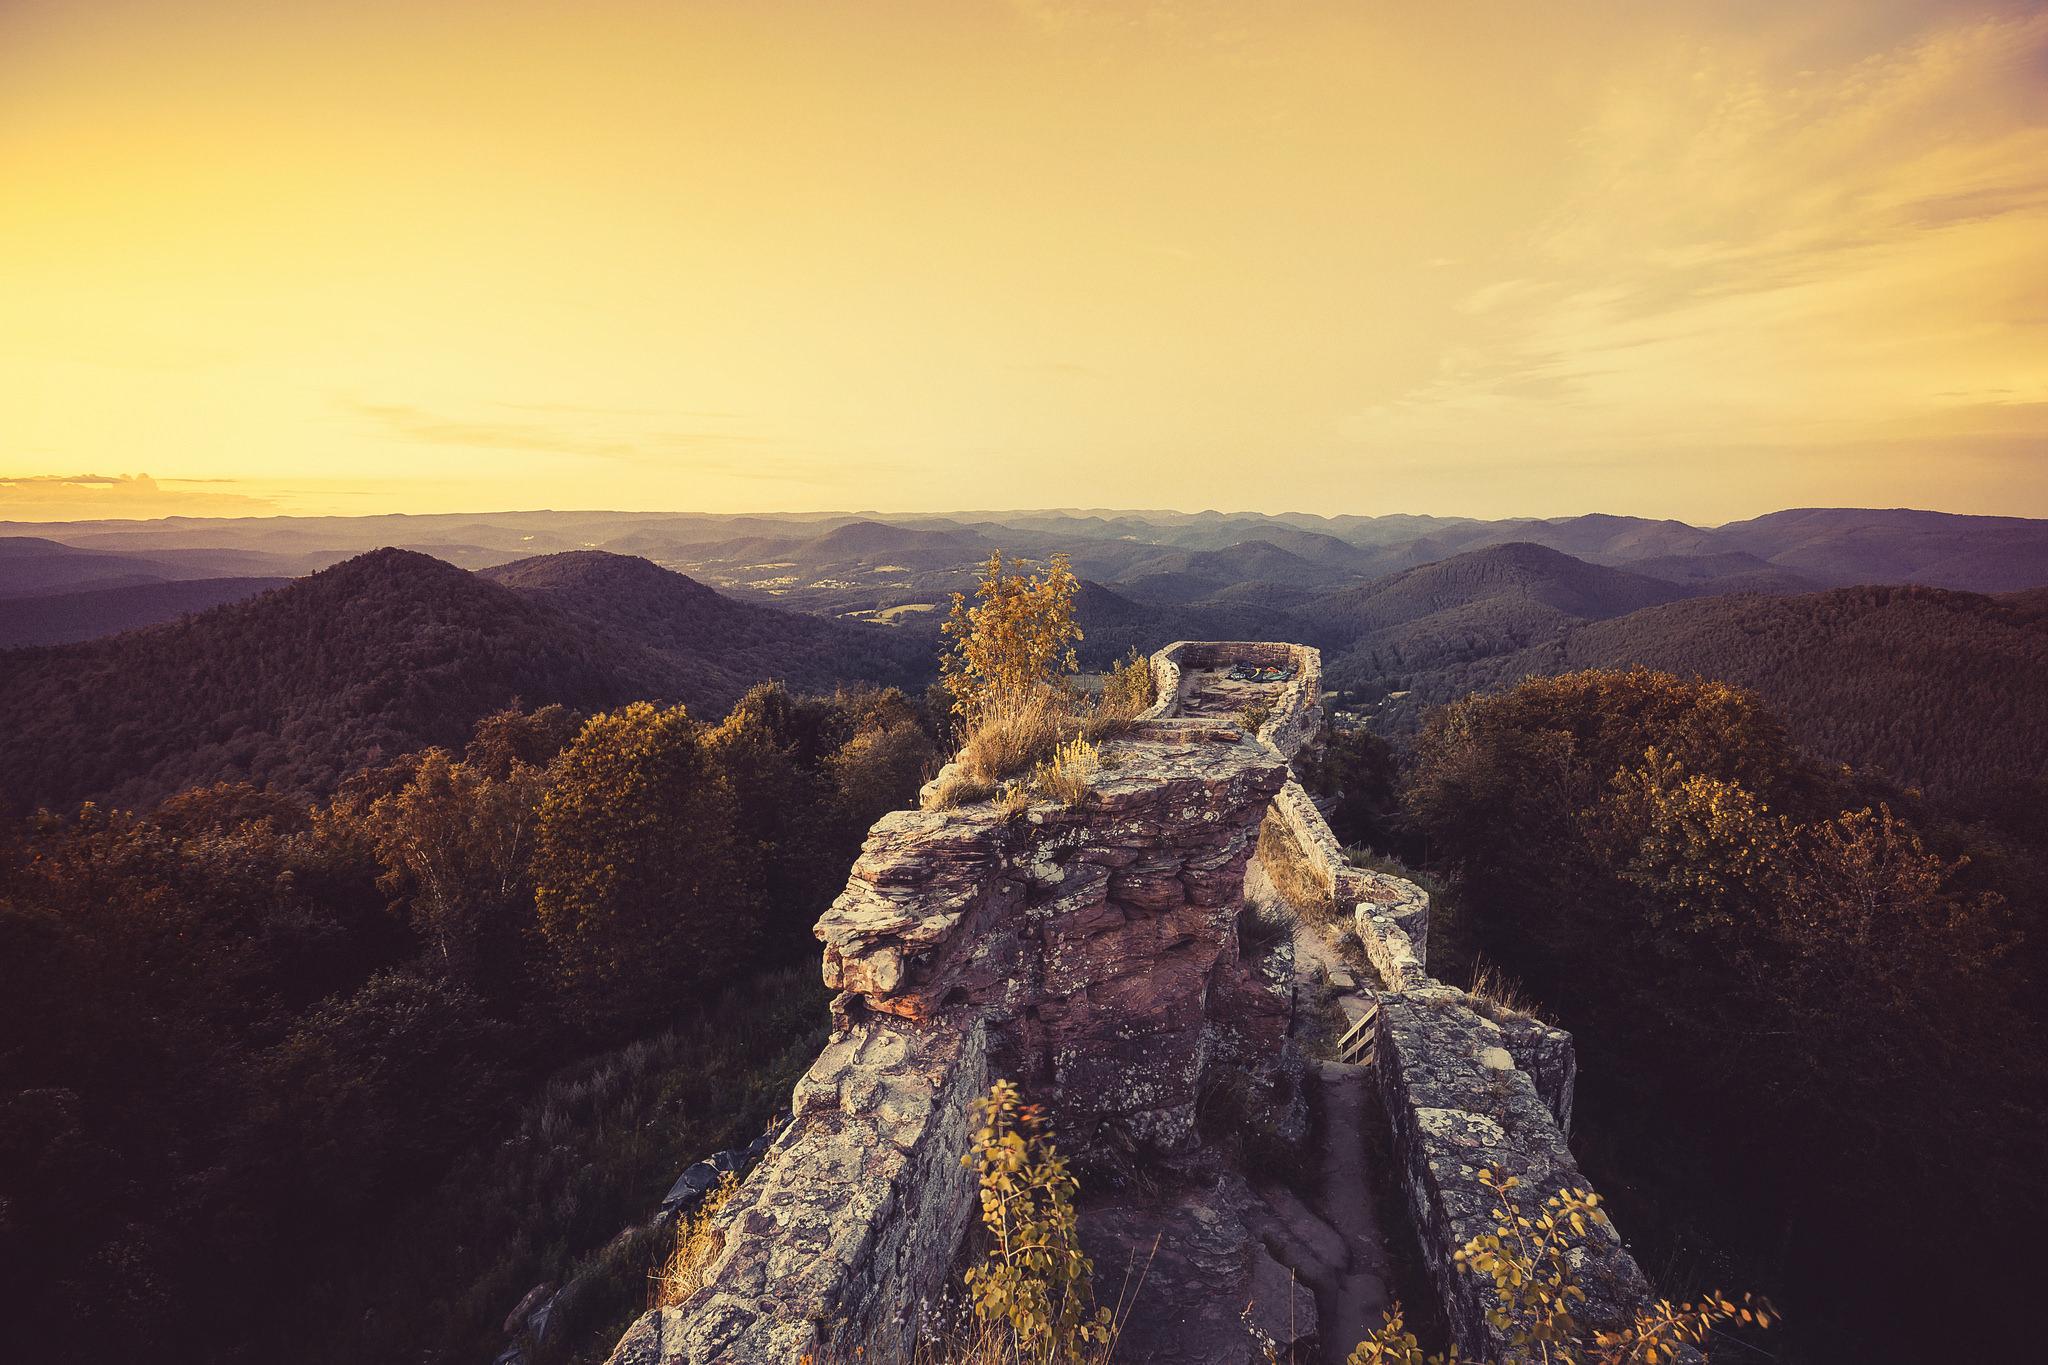 Landschaftsfotografie fotograf filmemacher frankfurt patrick schmetzer drohne landschaft natur 92